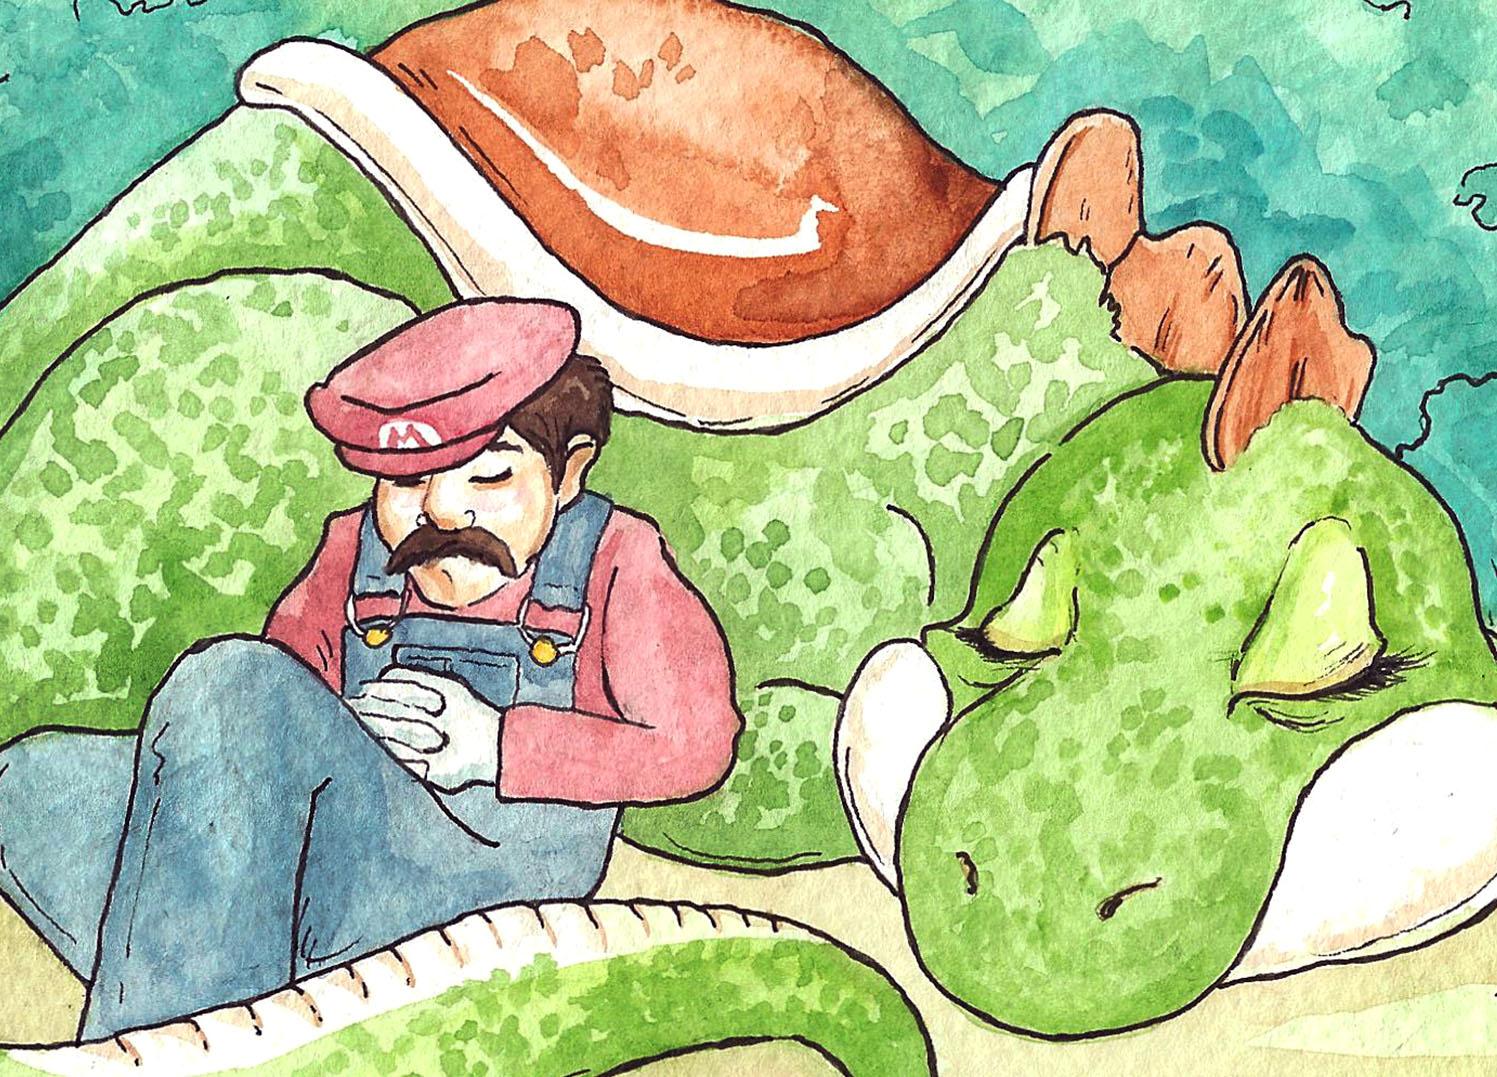 Georgia Dunn Studio: Mario, Yoshi, and the Seattle Retro Gaming Expo